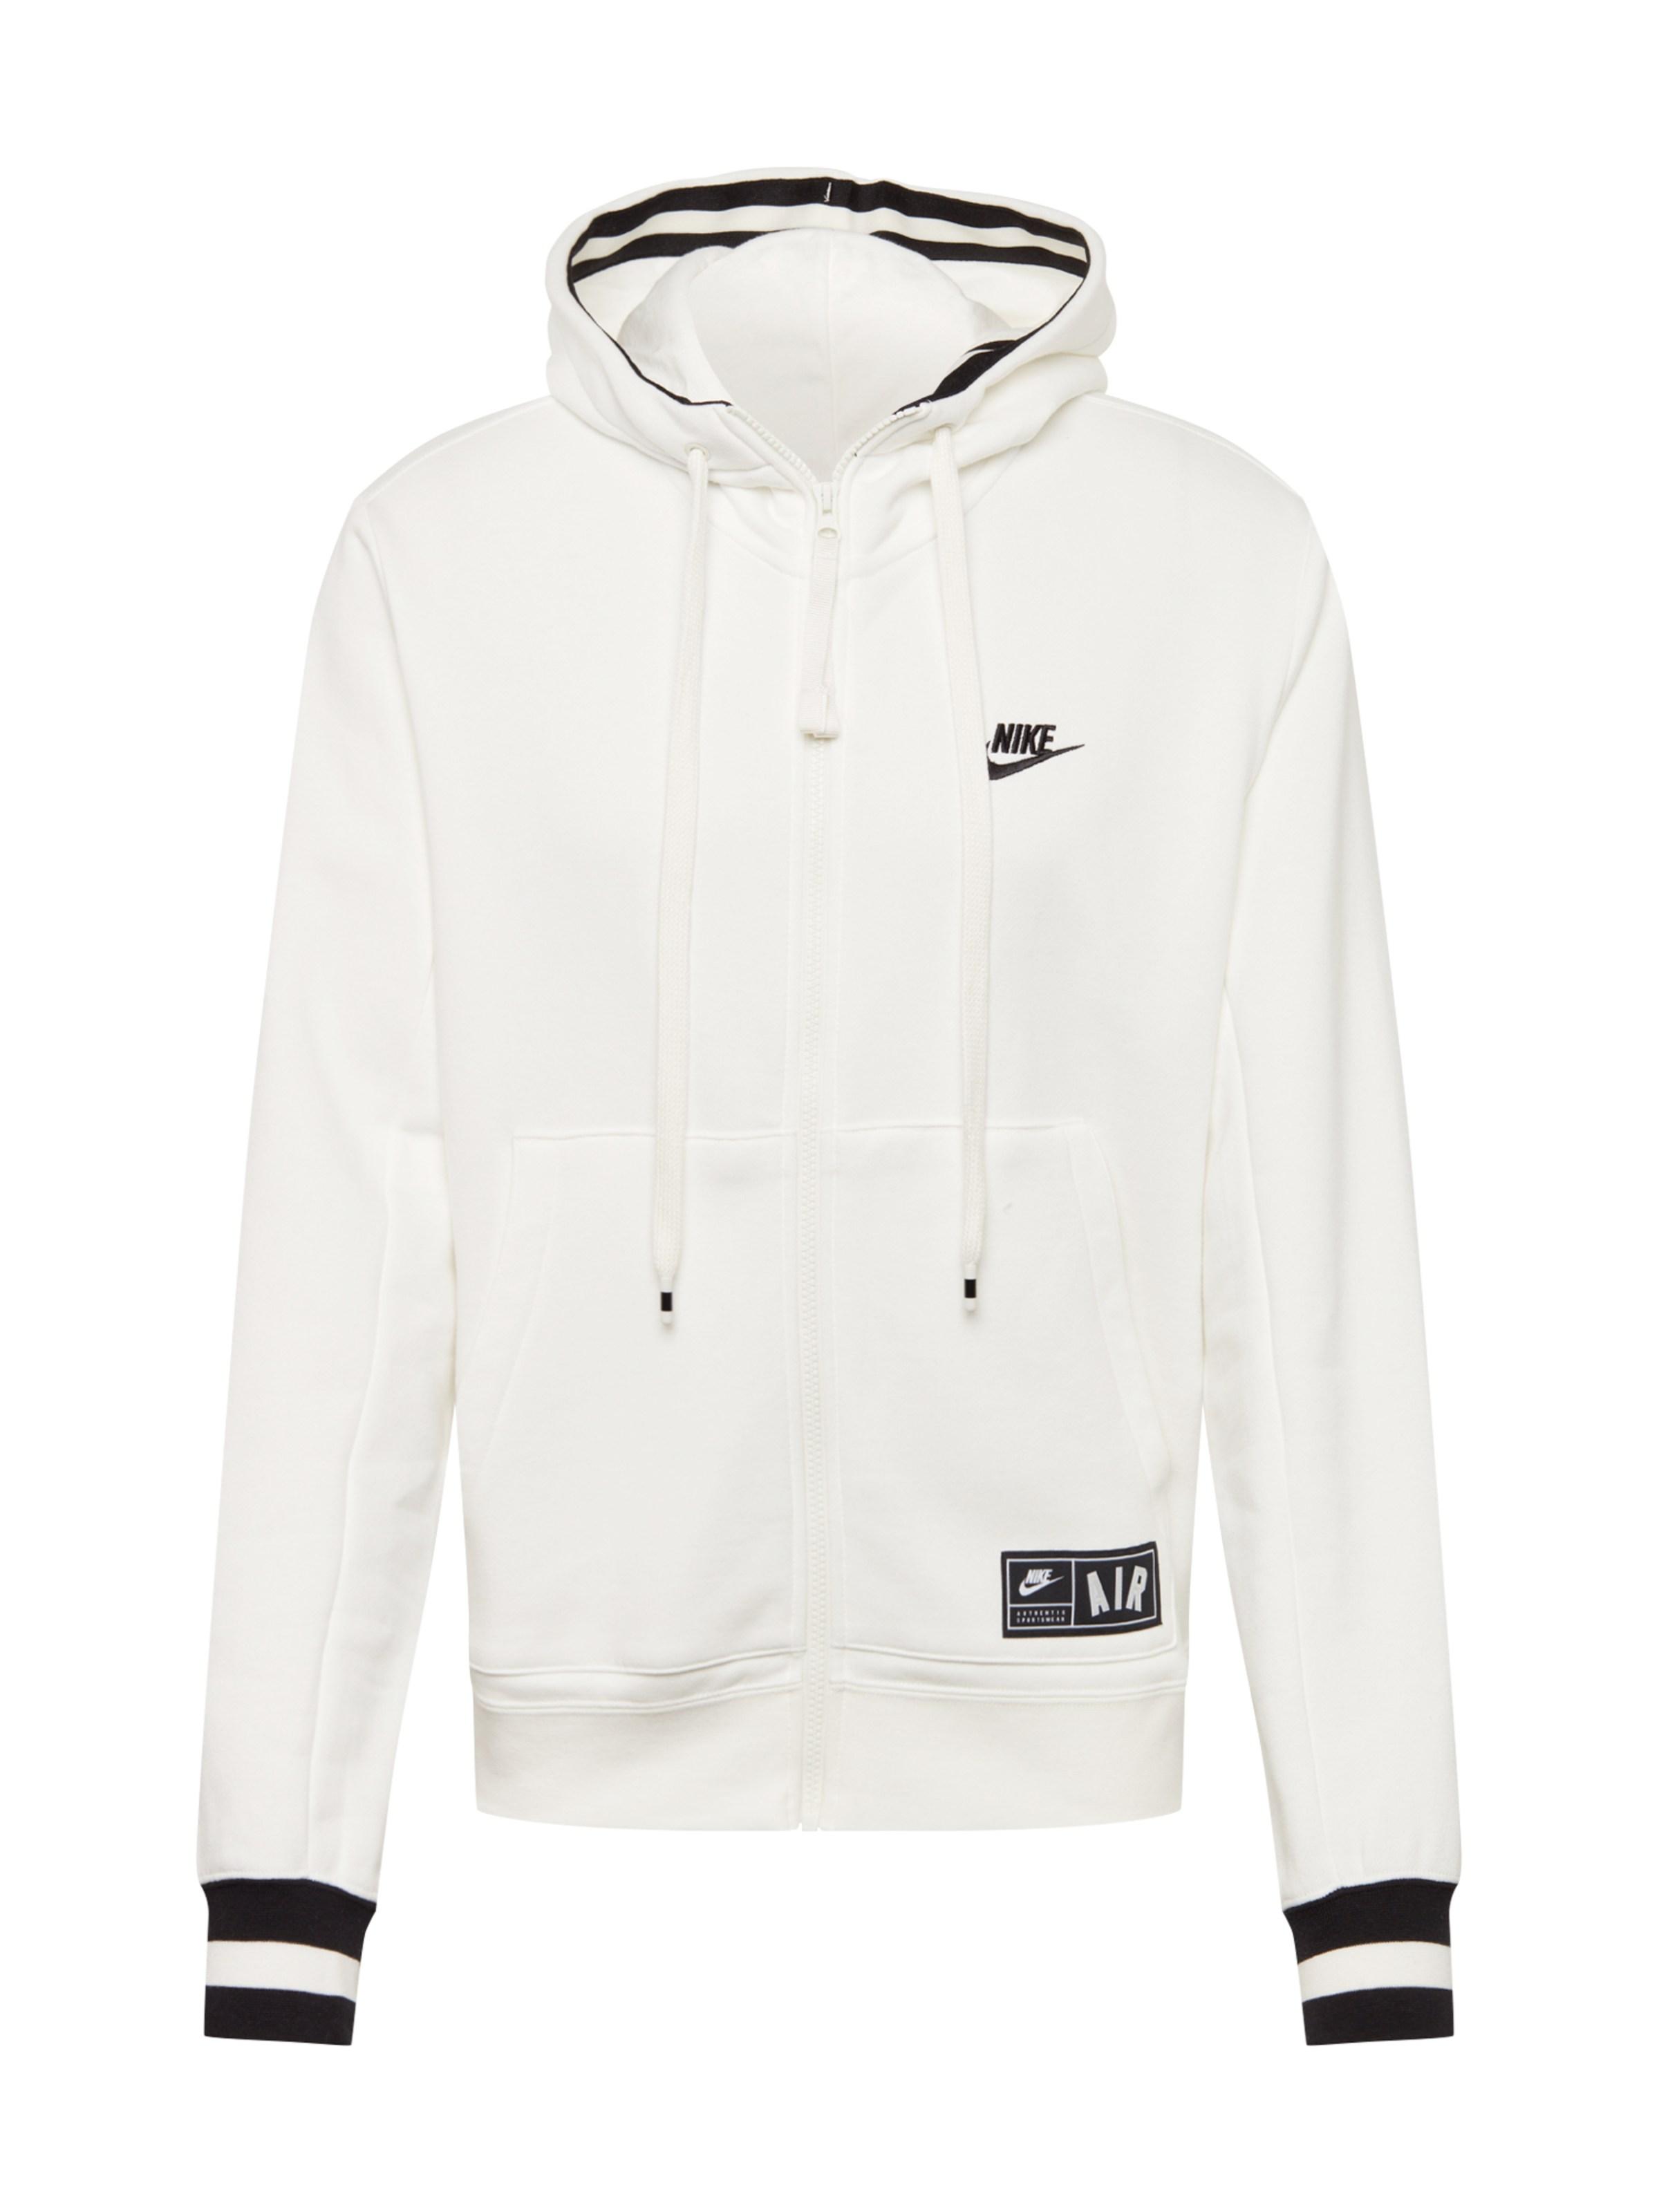 f48d094cca733 ... Nike Sportswear Tepláková bunda Biela. -20% -15%